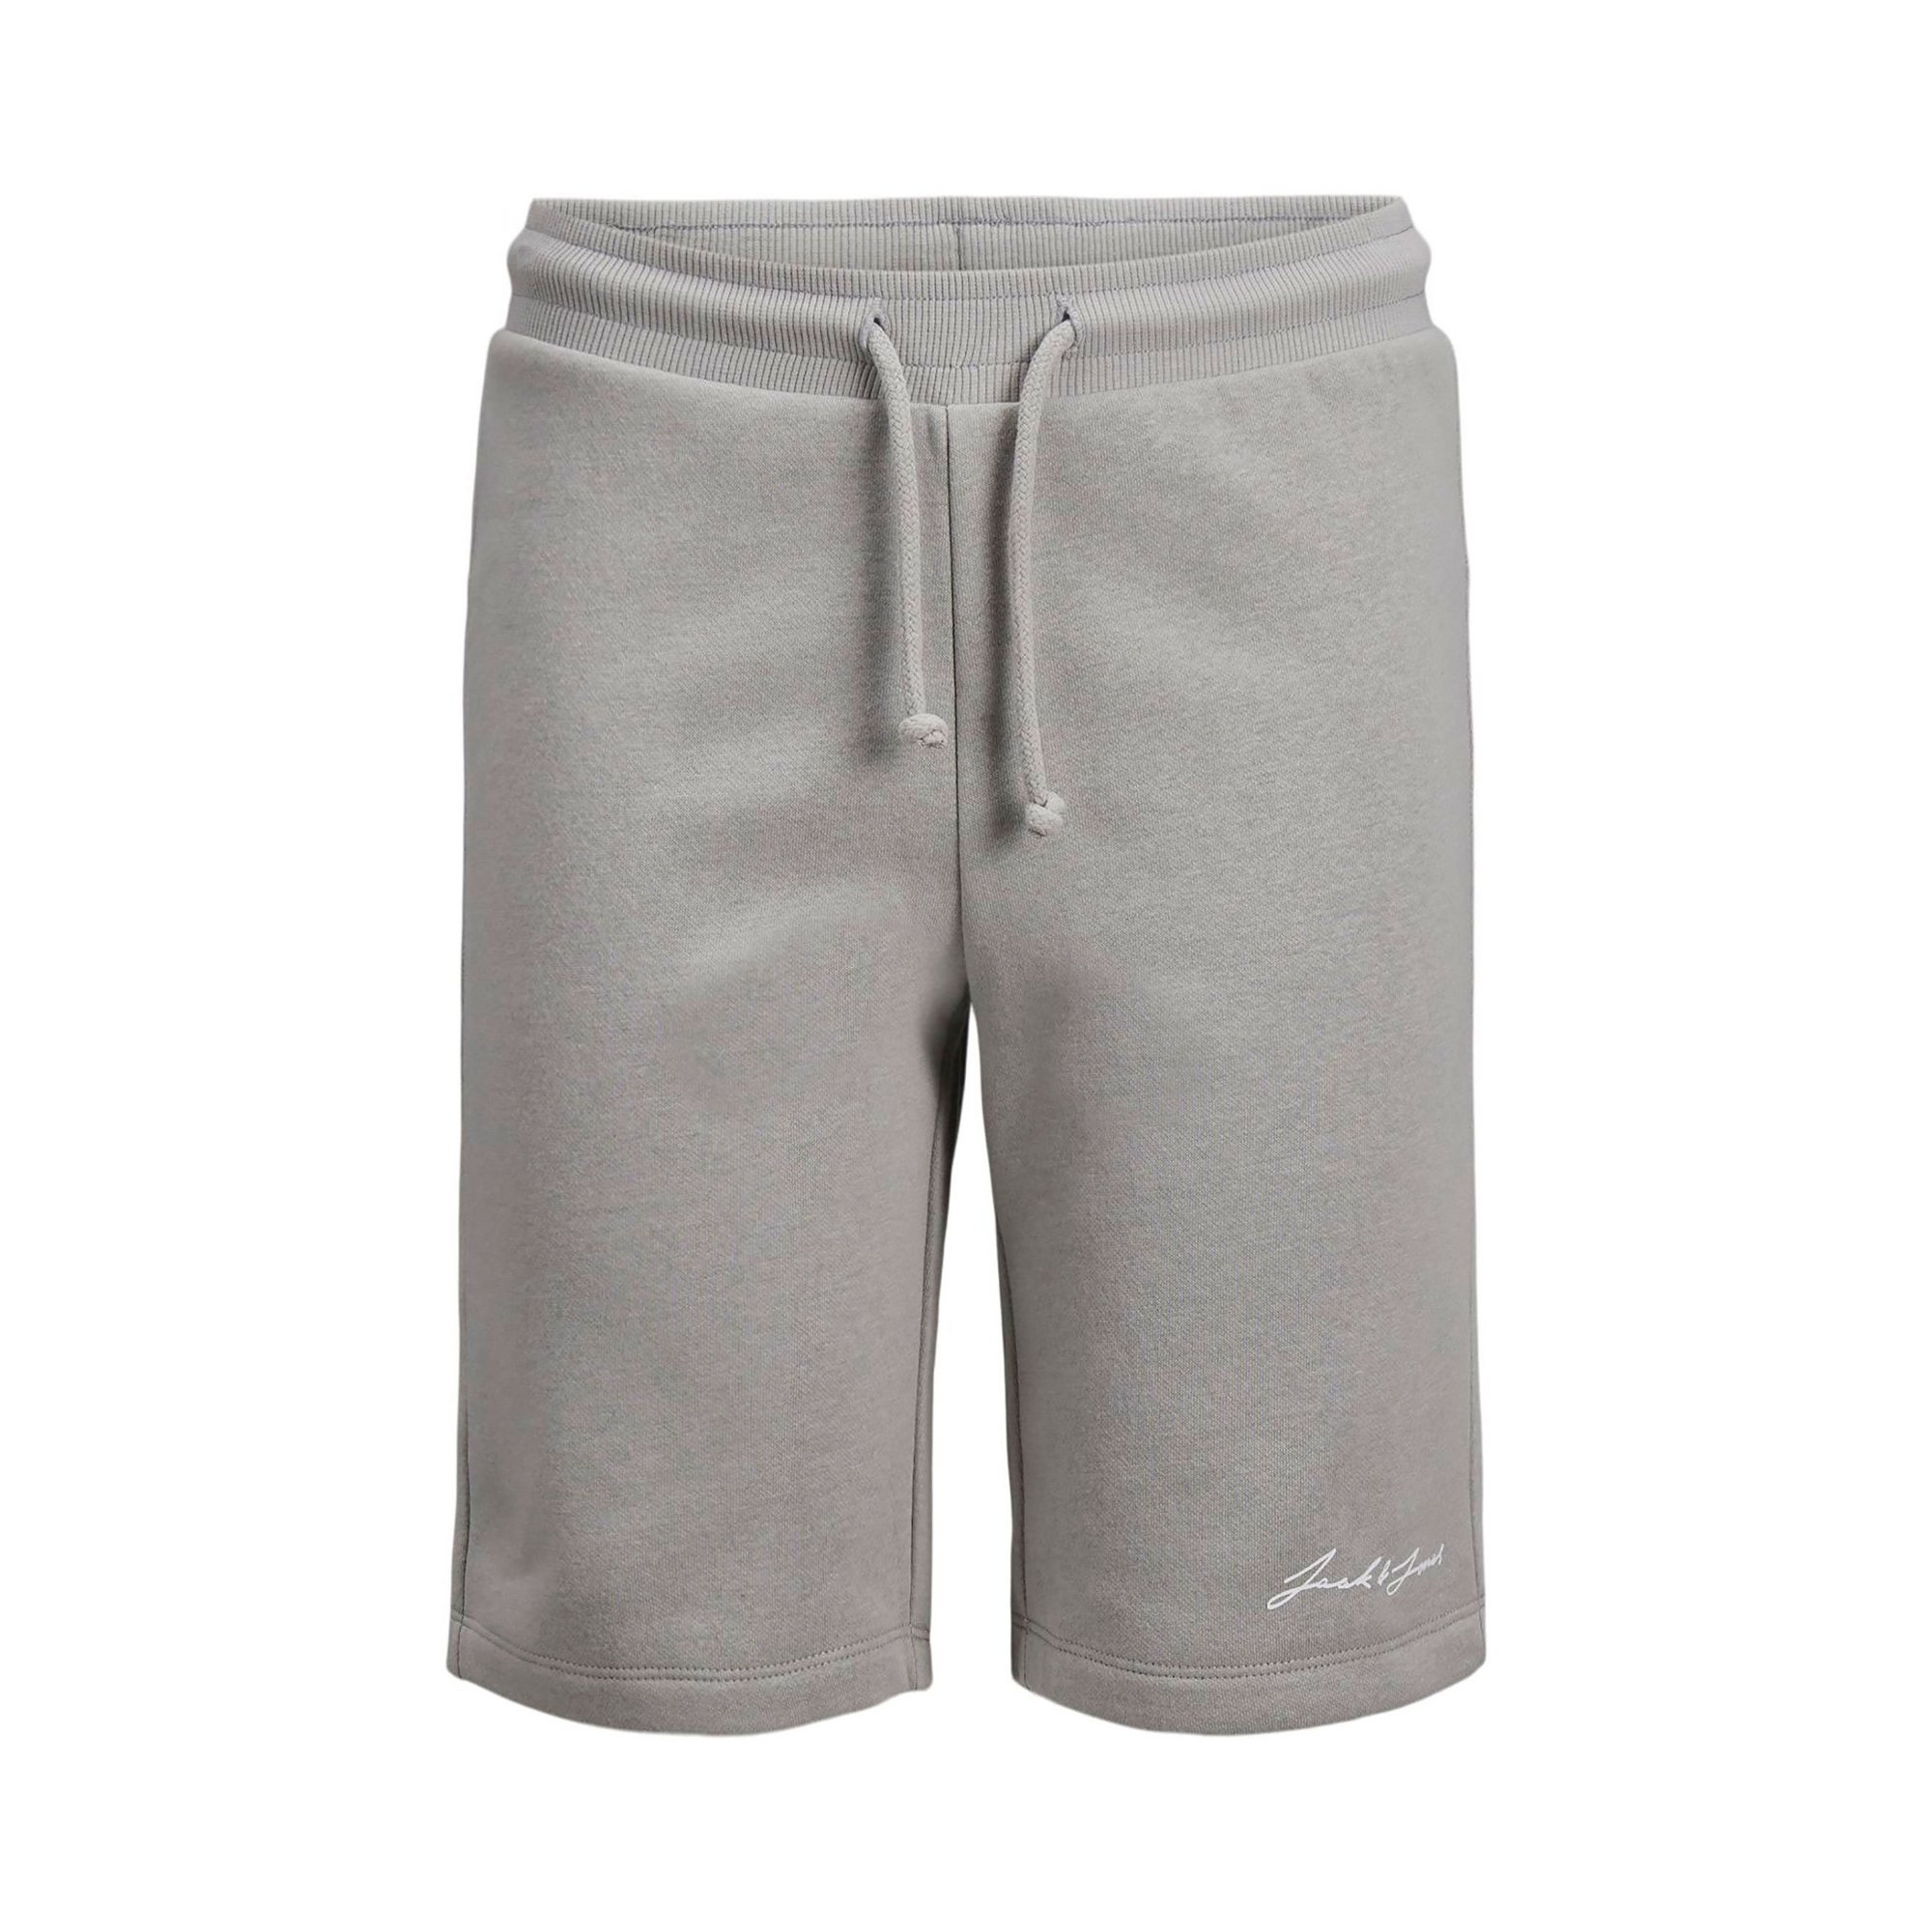 Image of Boys Jack and Jones Grey Shorts